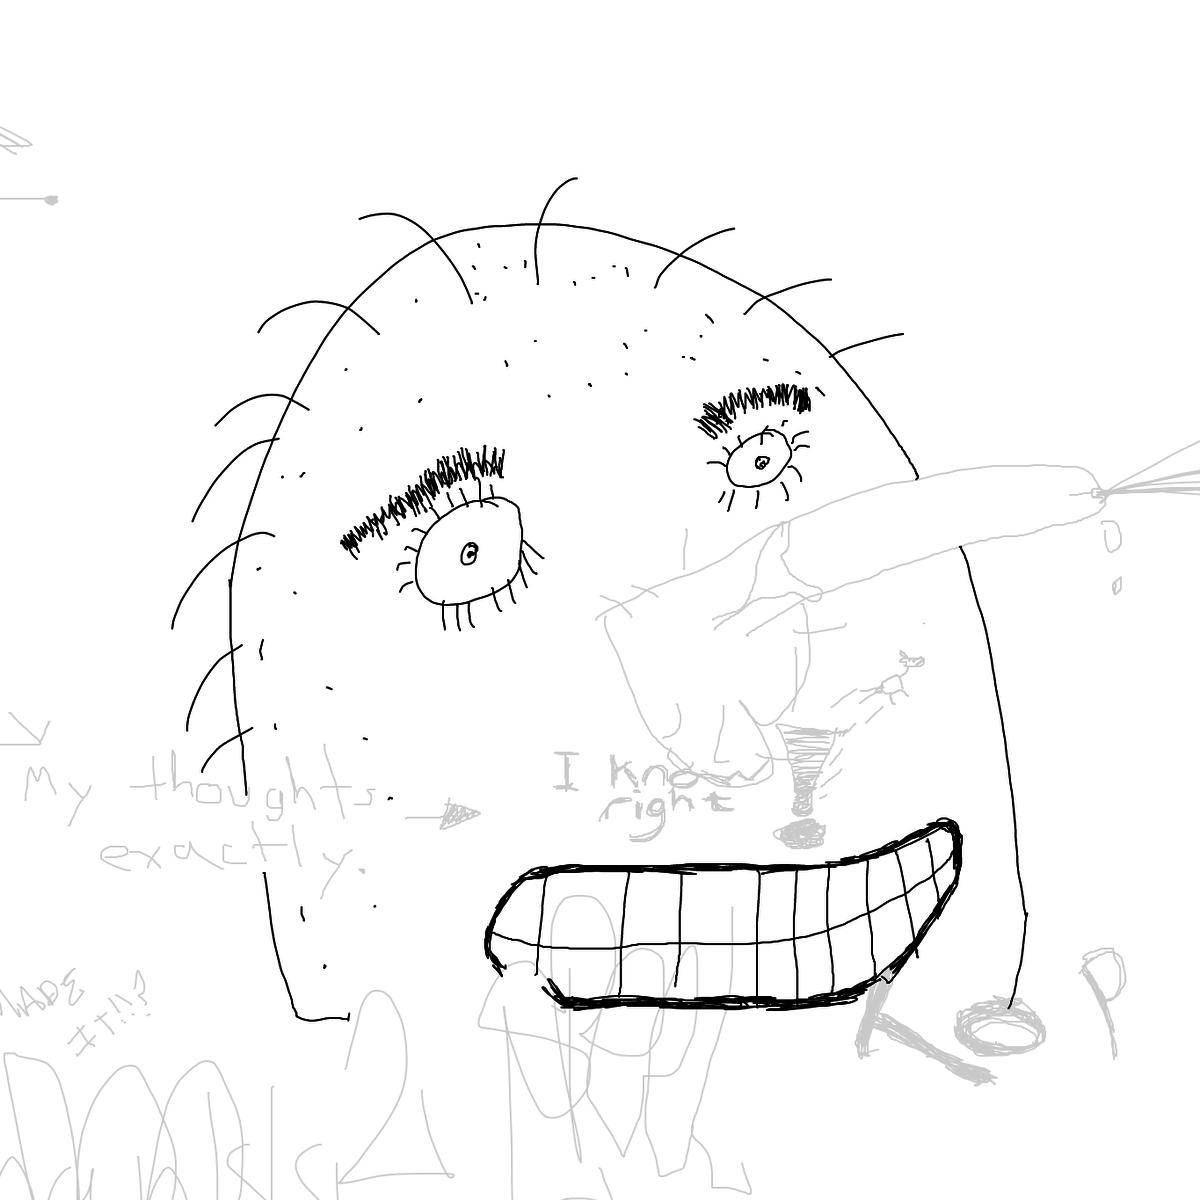 BAAAM drawing#18078 lat:40.7132301330566400lng: -74.0121688842773400